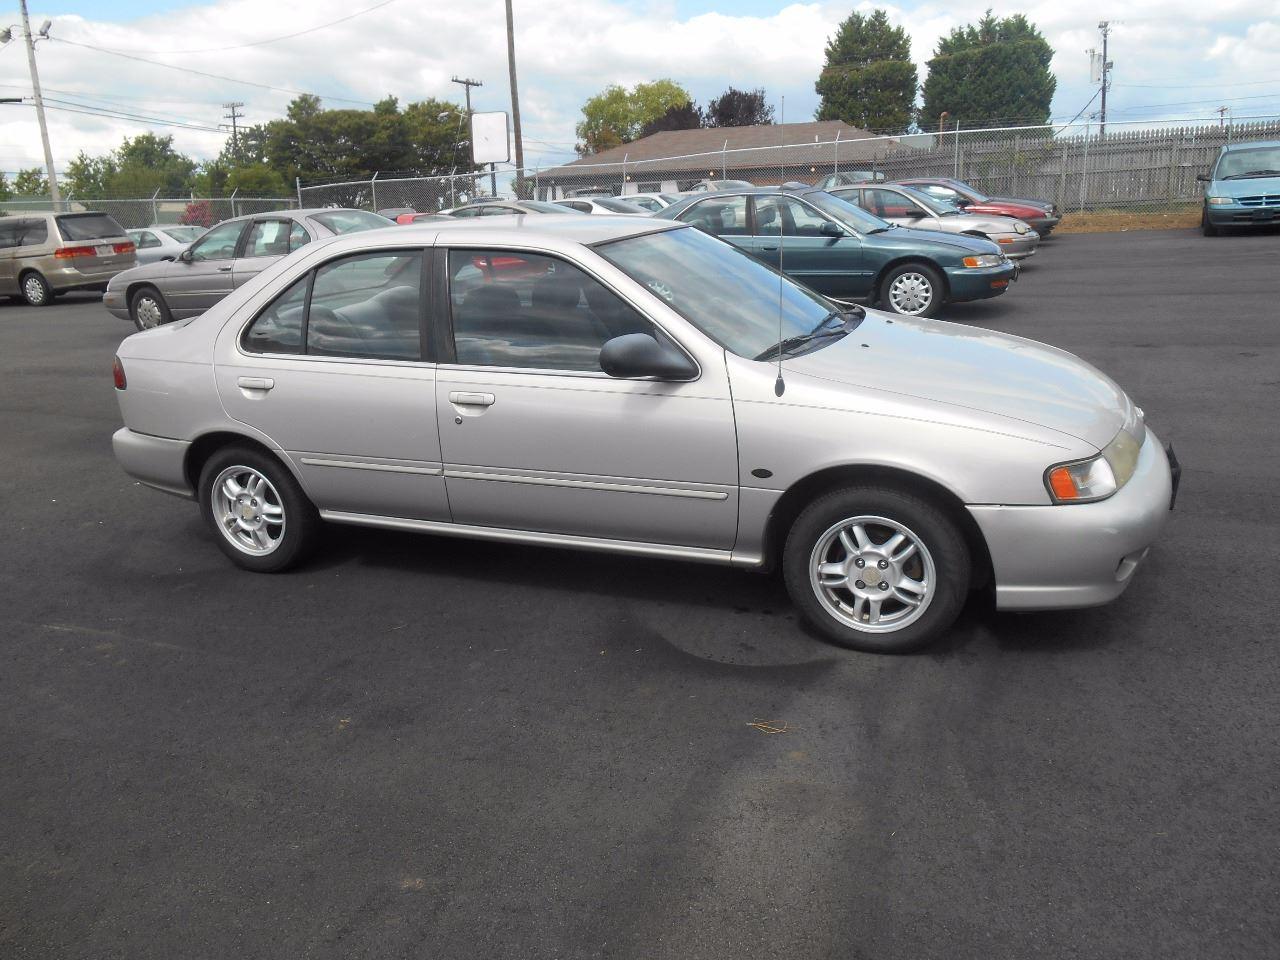 1999 nissan sentra gxe 4dr sedan in charlotte nc mike s auto sales of charlotte 1999 nissan sentra gxe 4dr sedan in